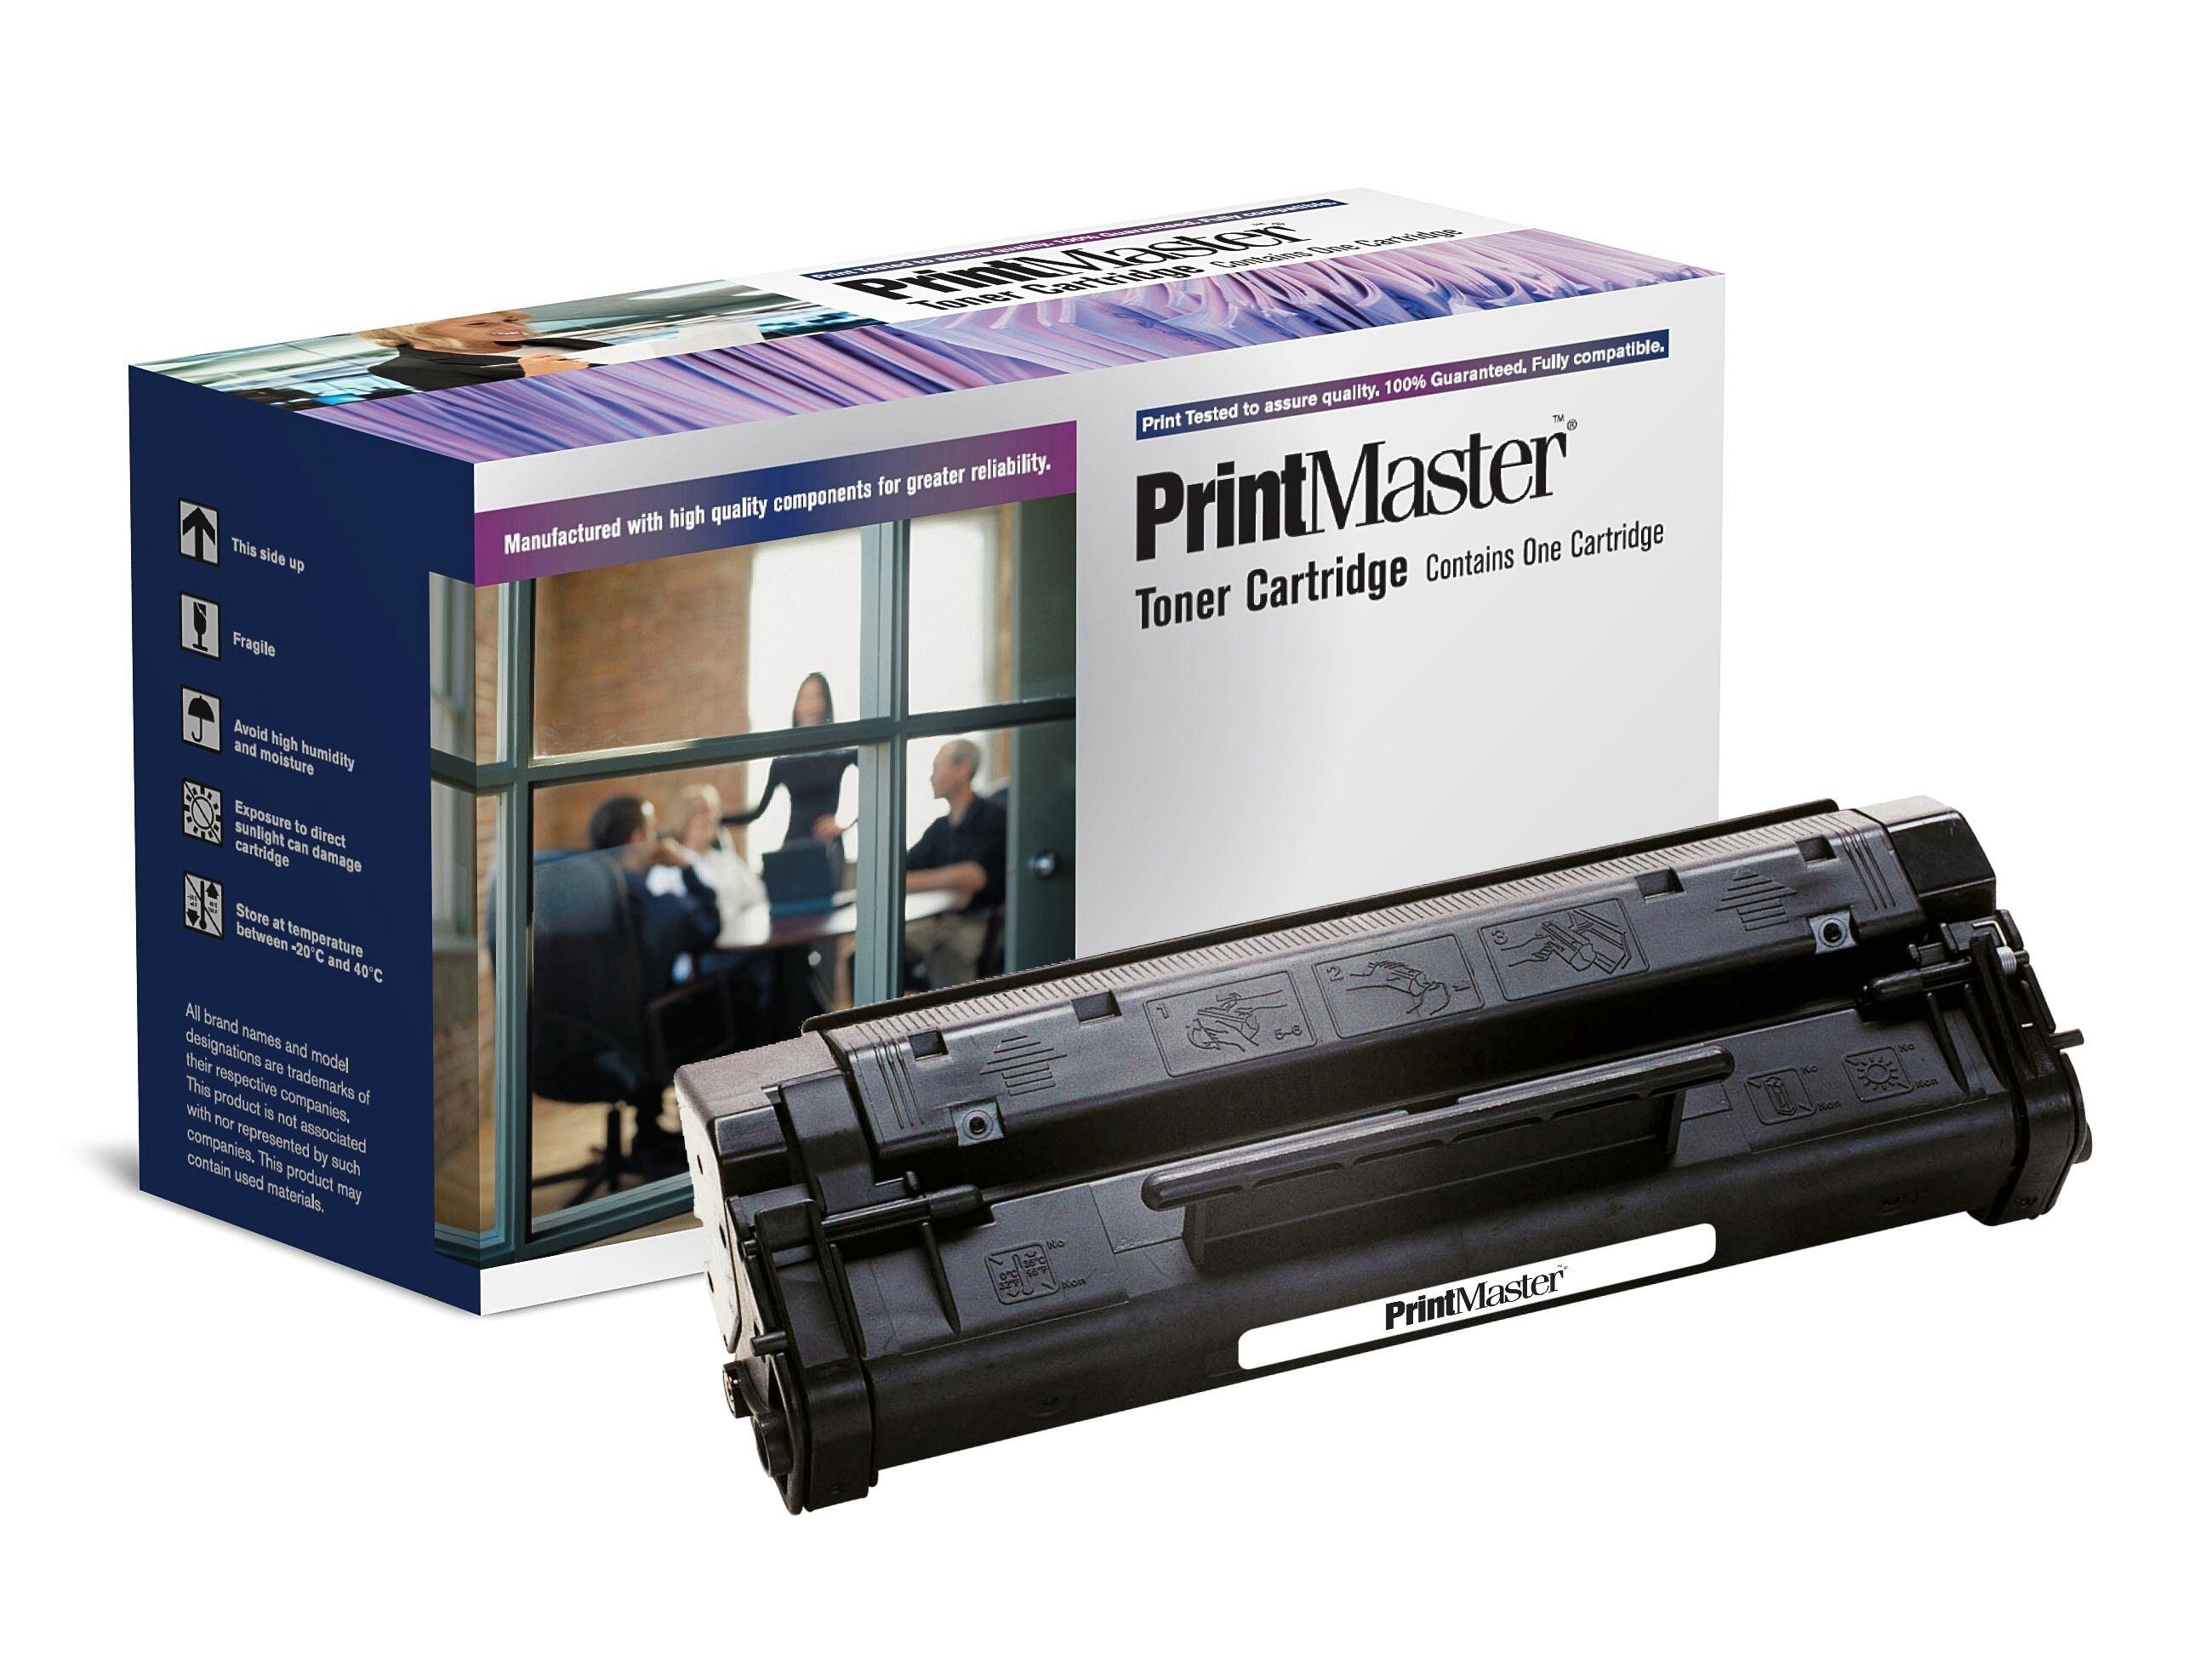 PrintMaster HP LaserJet 1100 C4092A